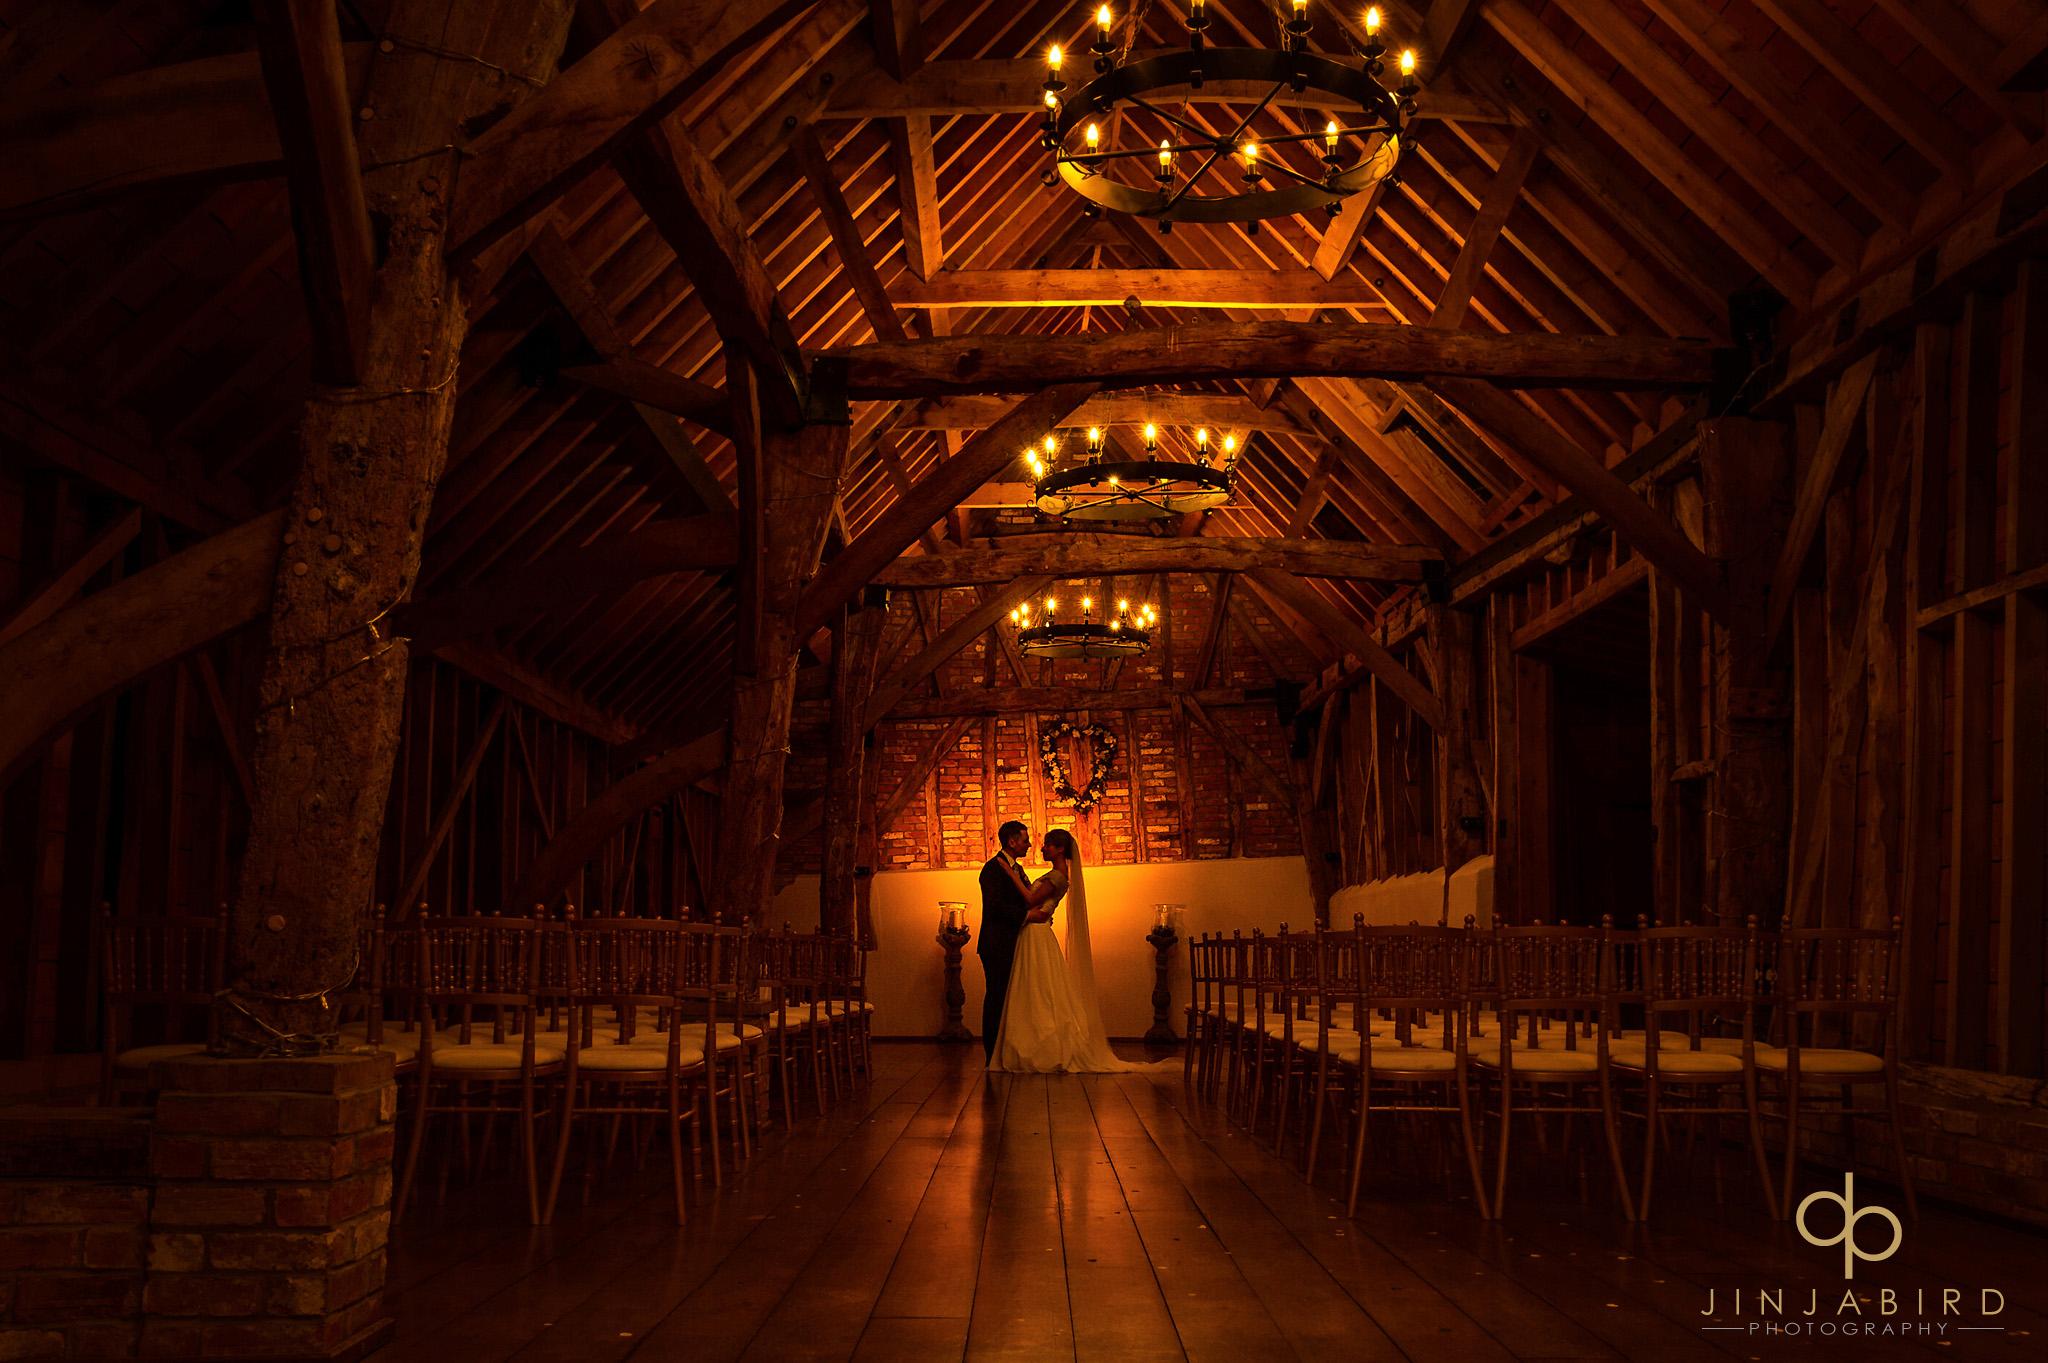 night time photo in barn bassmead manor